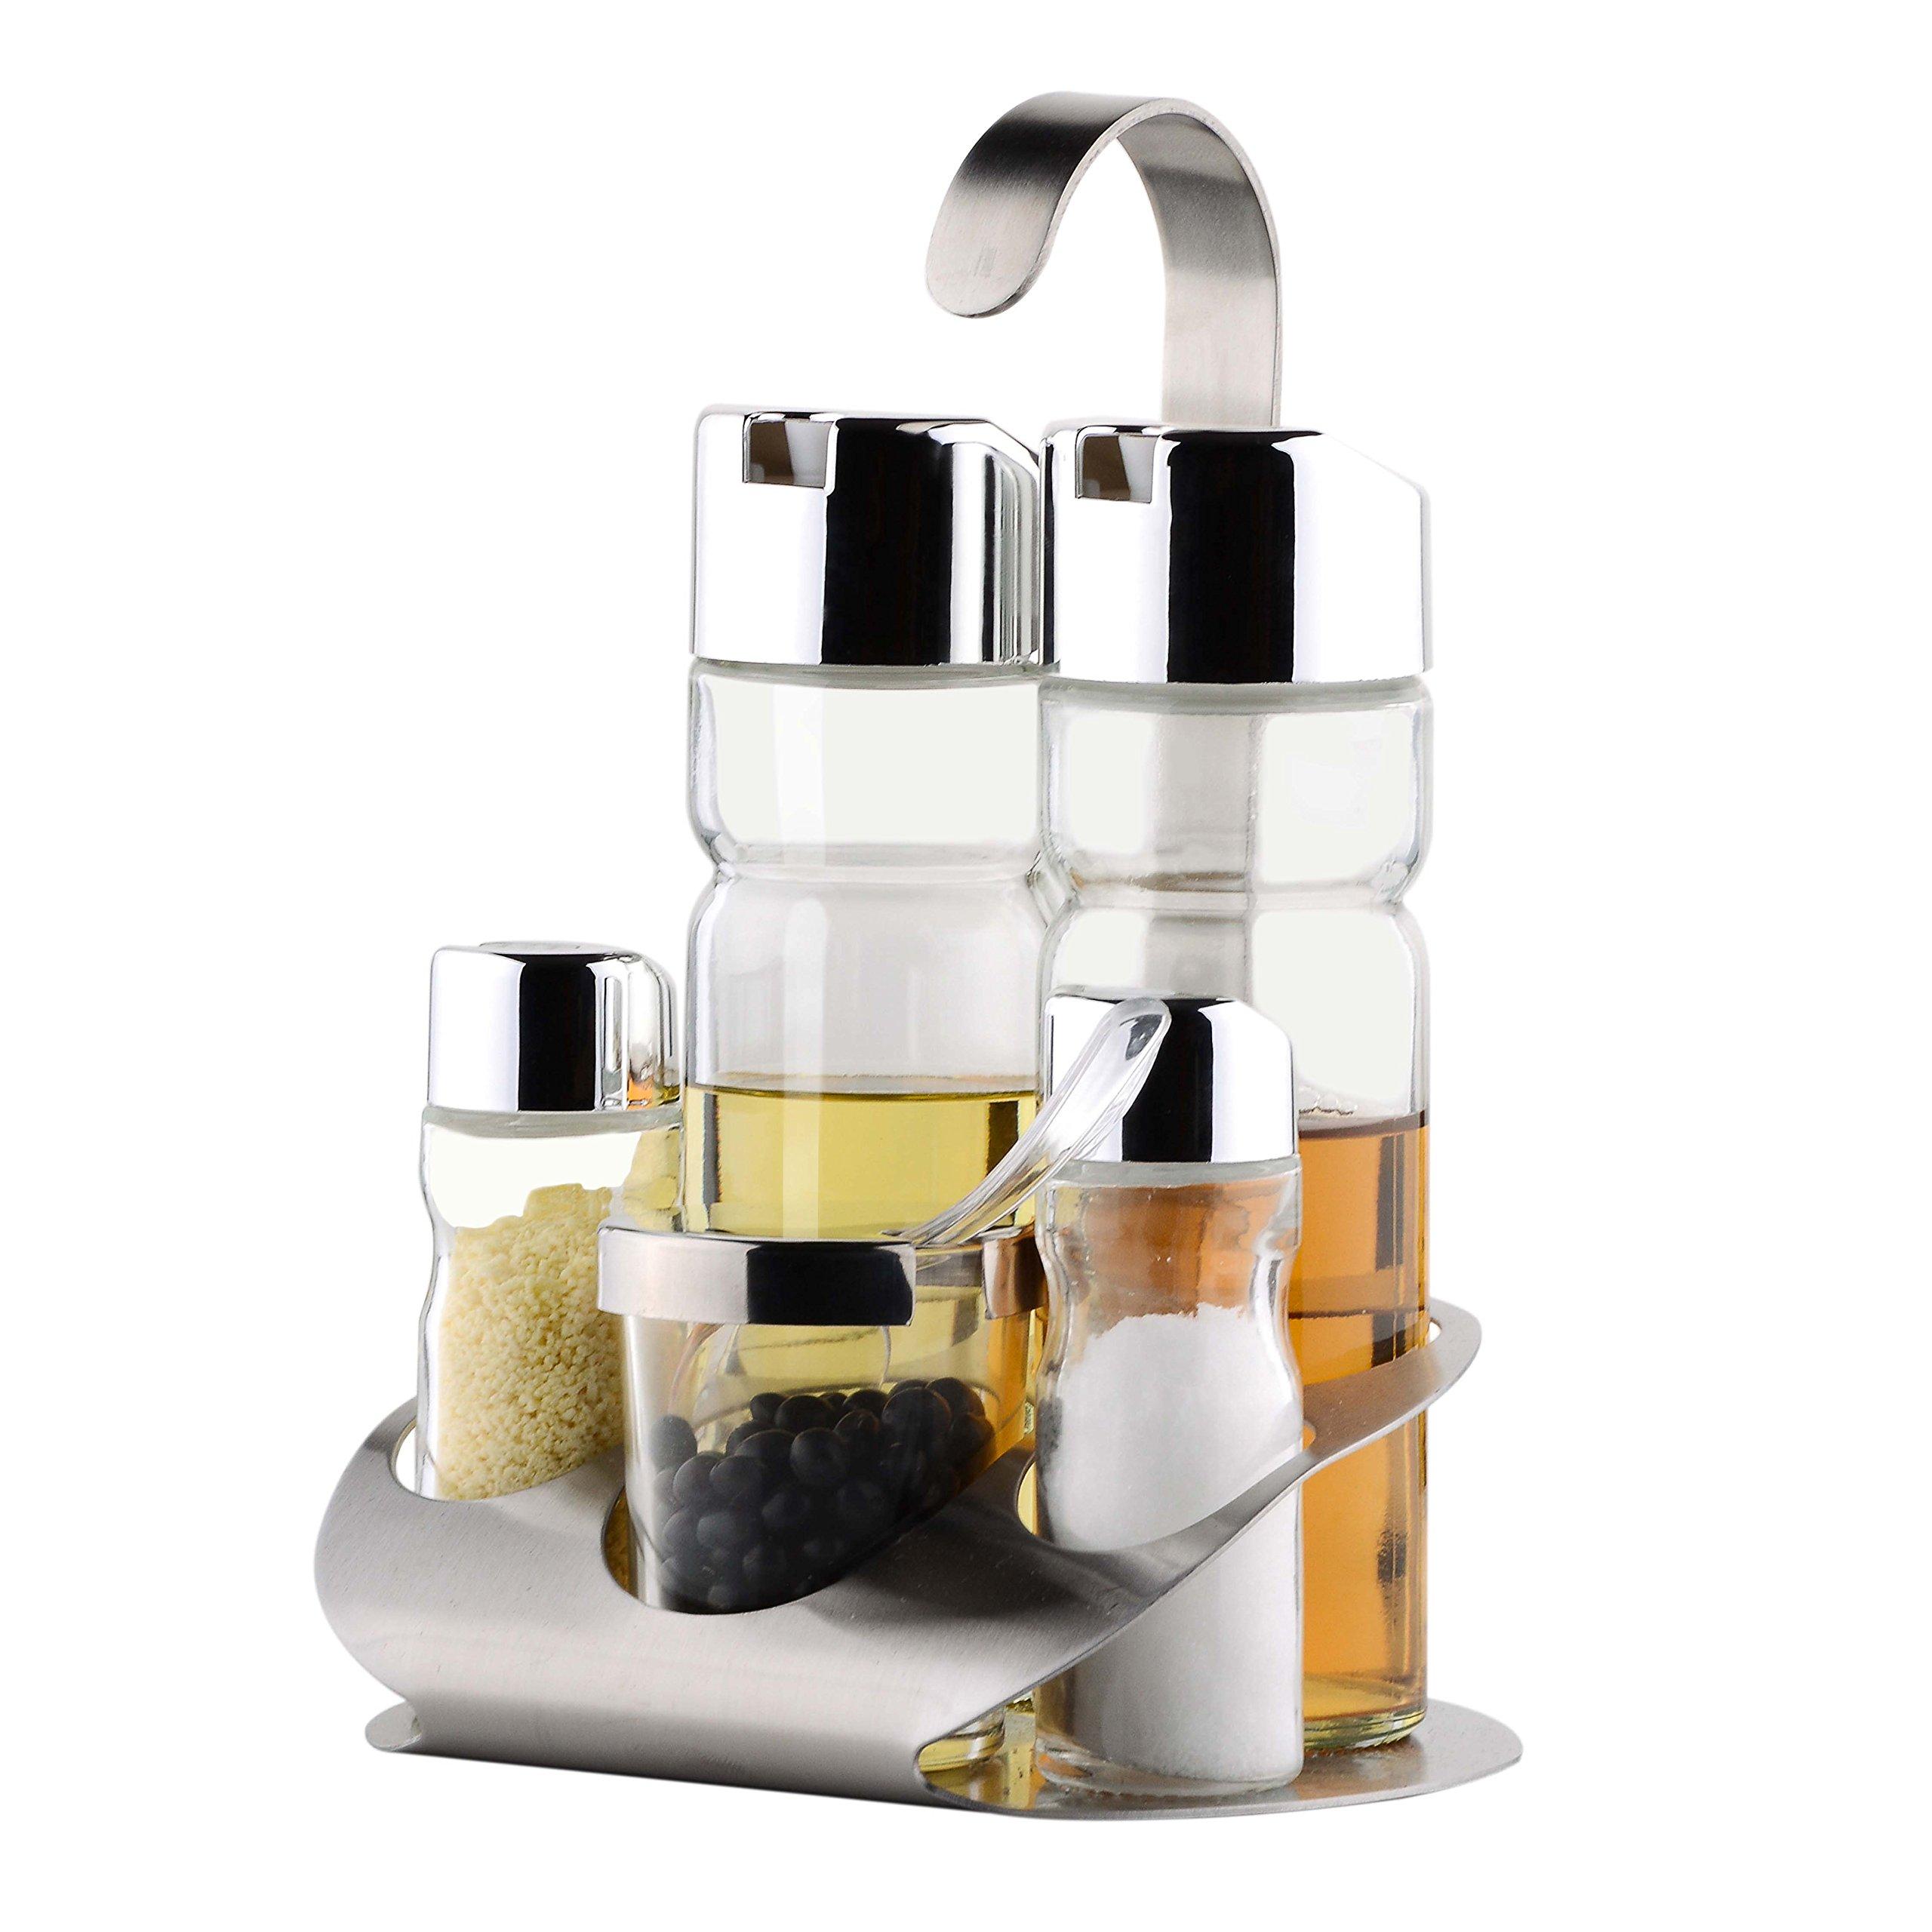 Spice Rack Set,OKOMATCH Stainless Steel Stand Holder with 5 Empty Glass Bottles - Including Olive Oil/Vinegar Dispensers/Cruet/Small Salt and Pepper Shaker